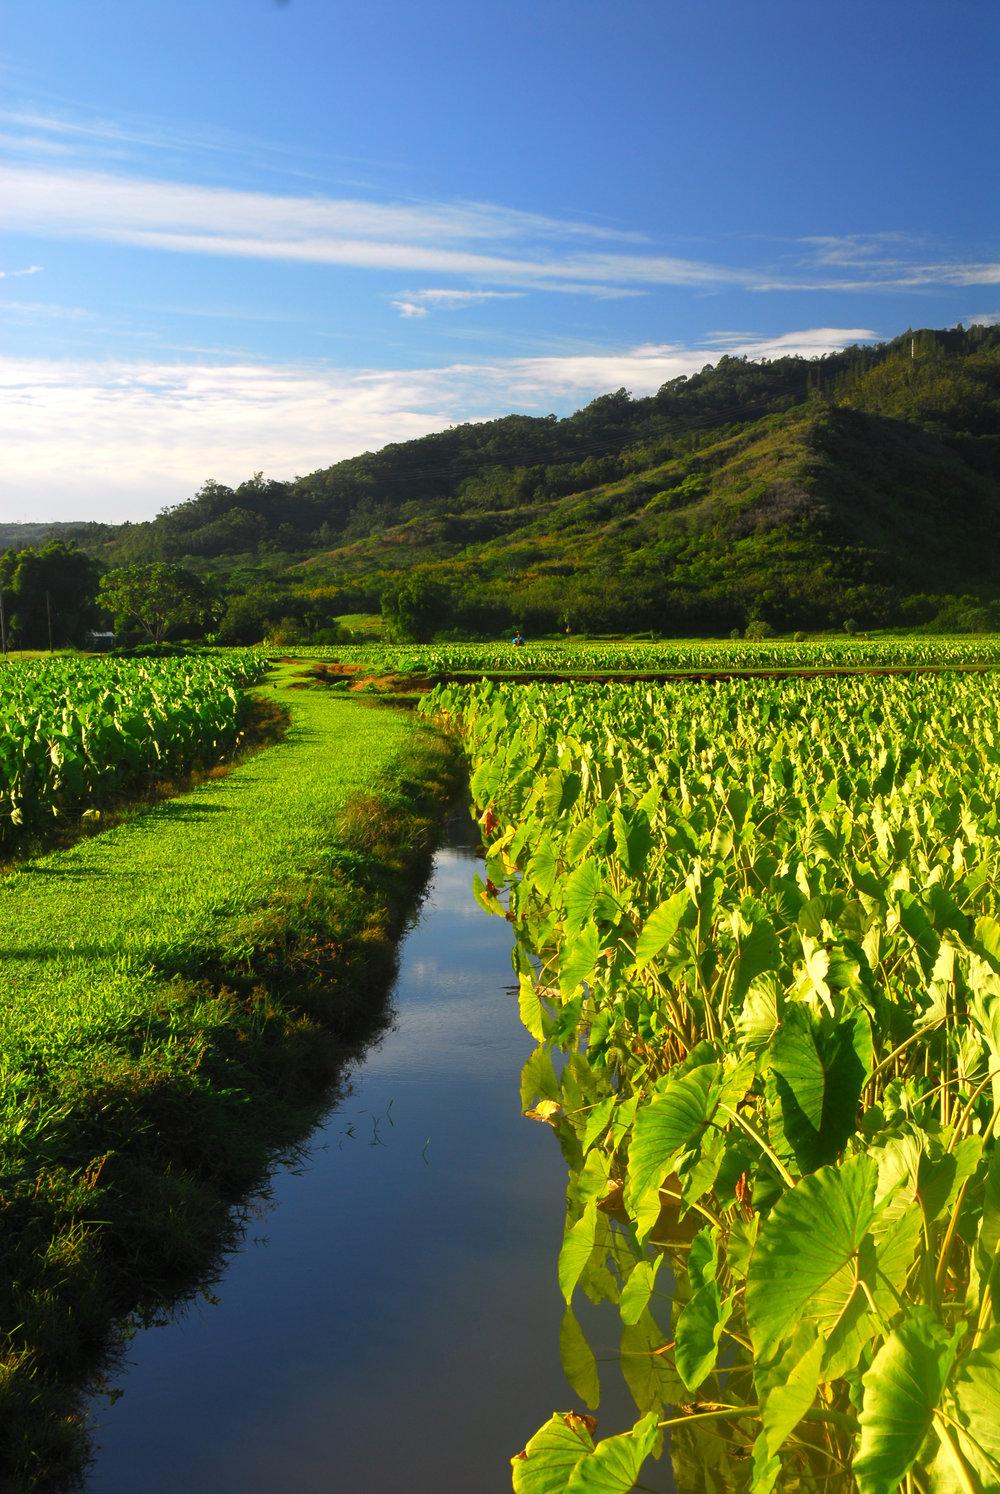 Taro field in Hawaii